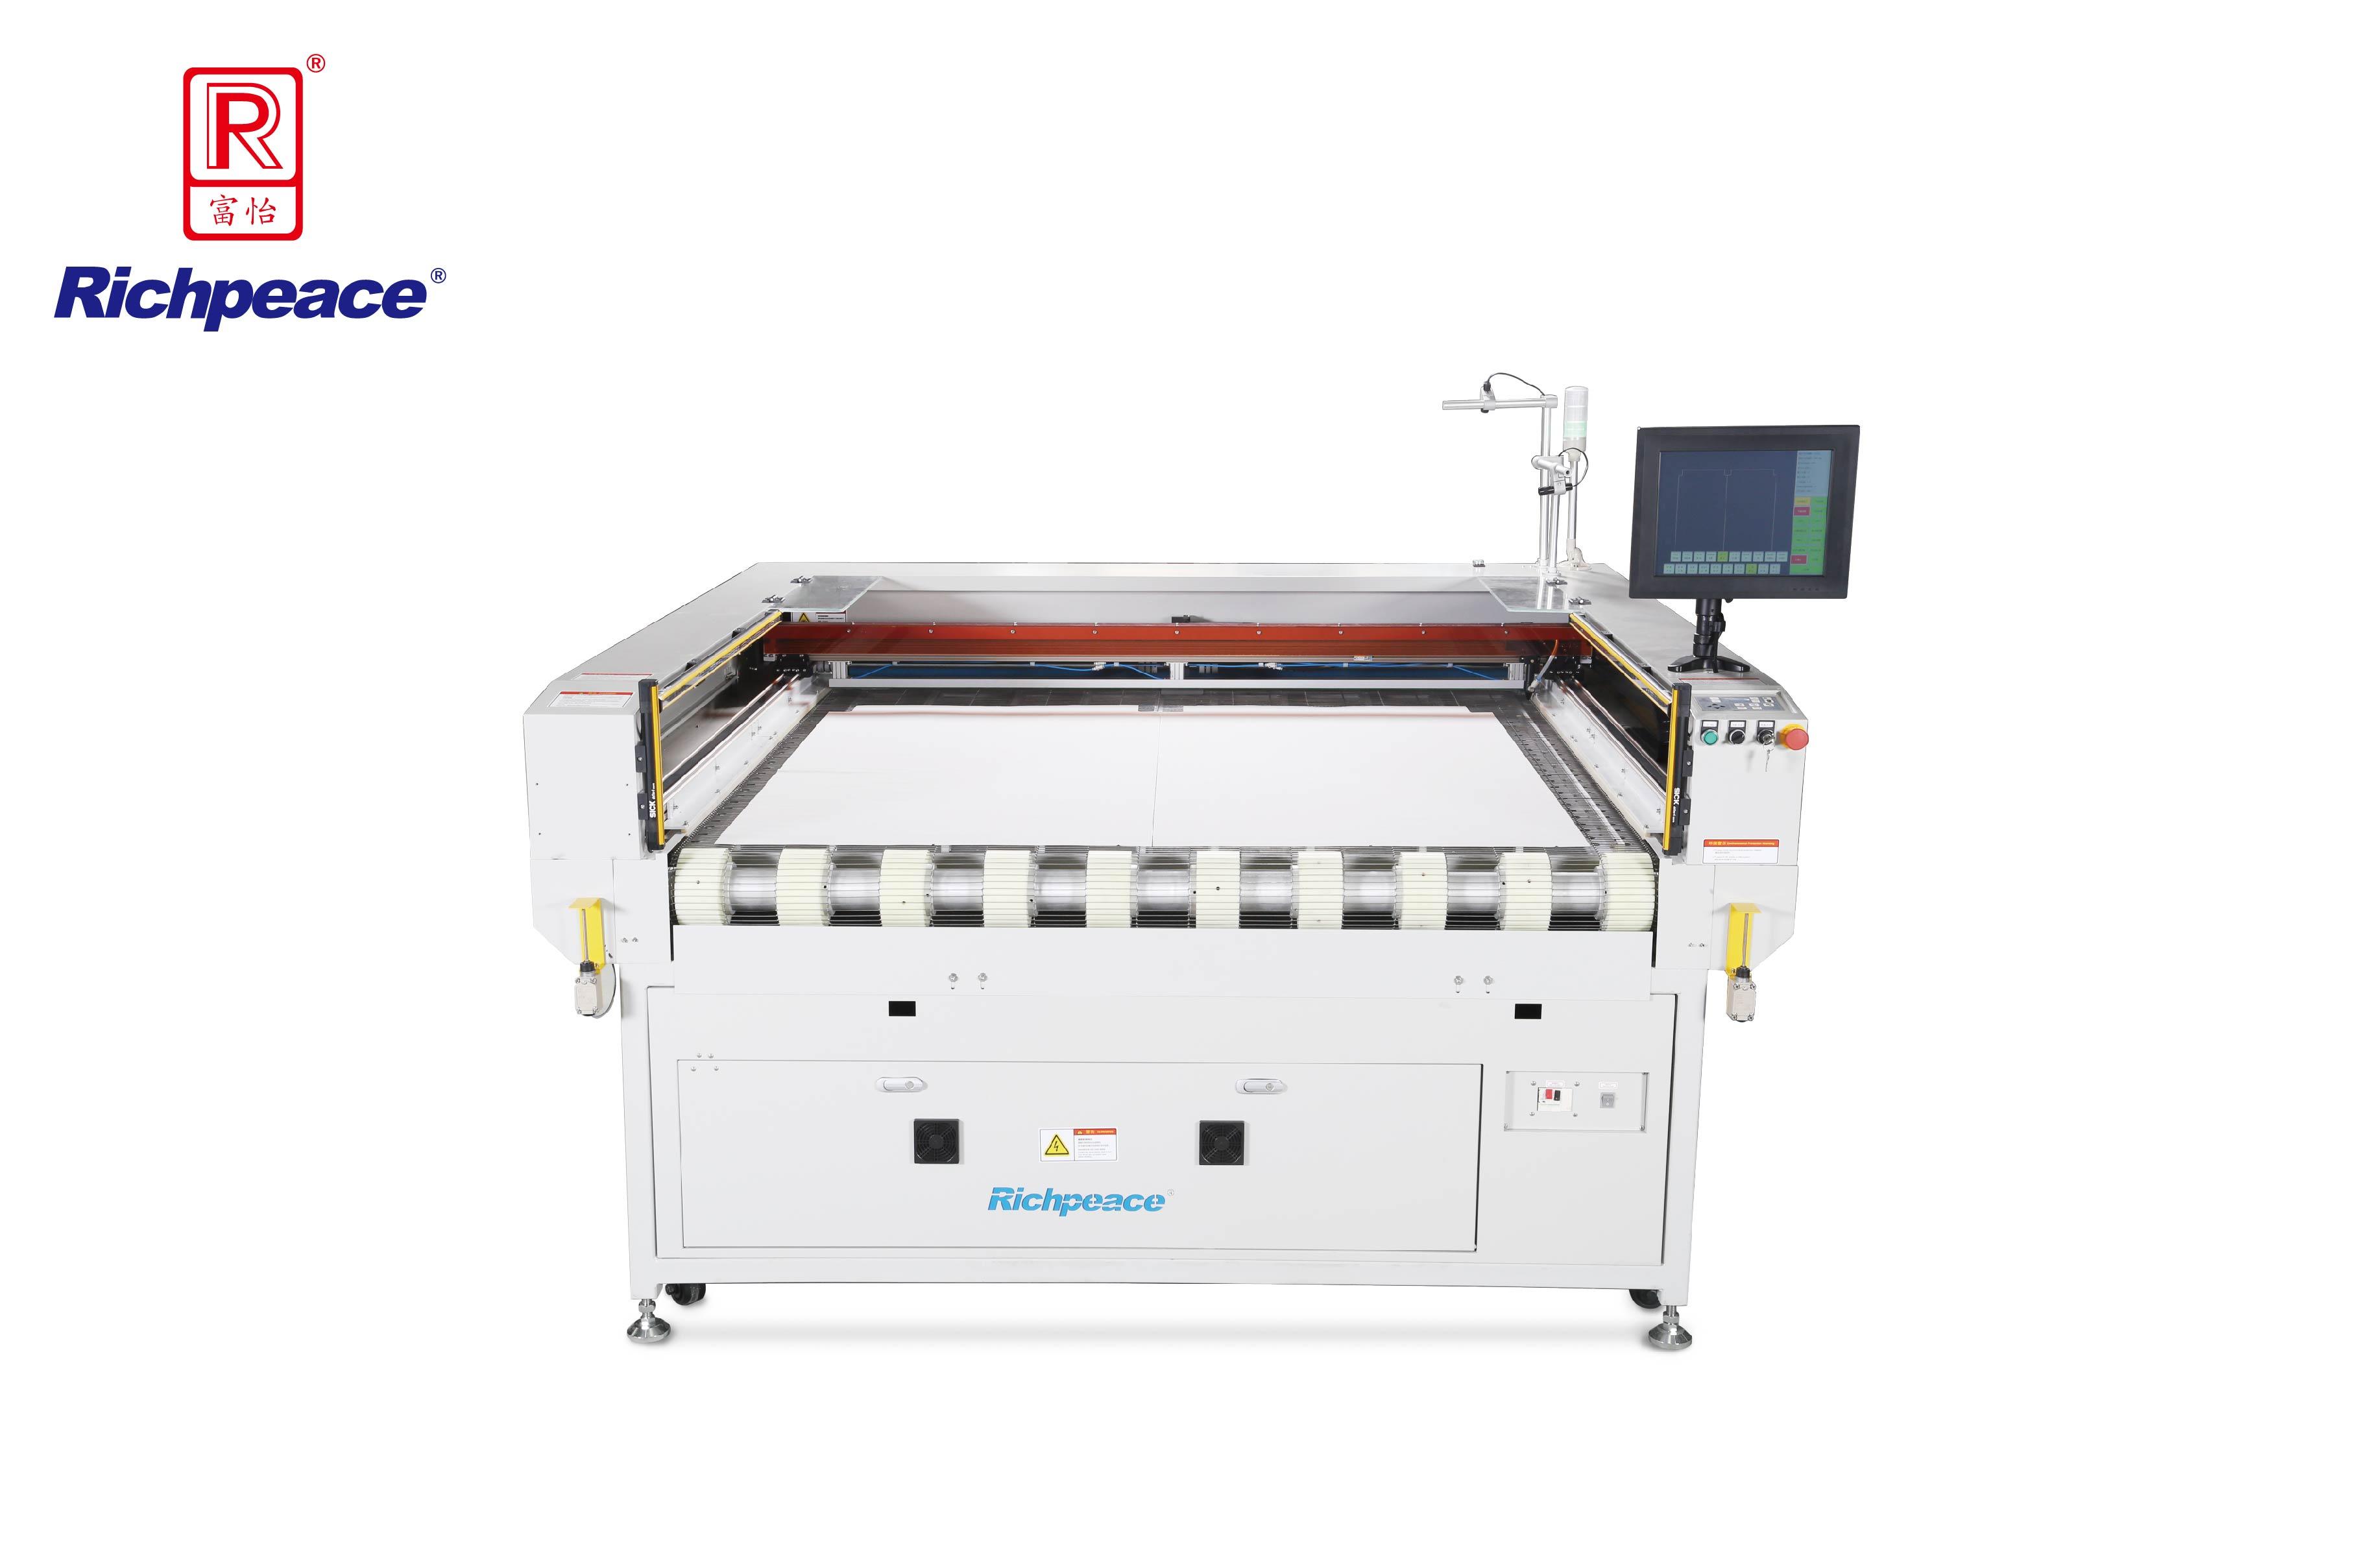 Richpeace Laser Cutting Machine on Automotive Interiors